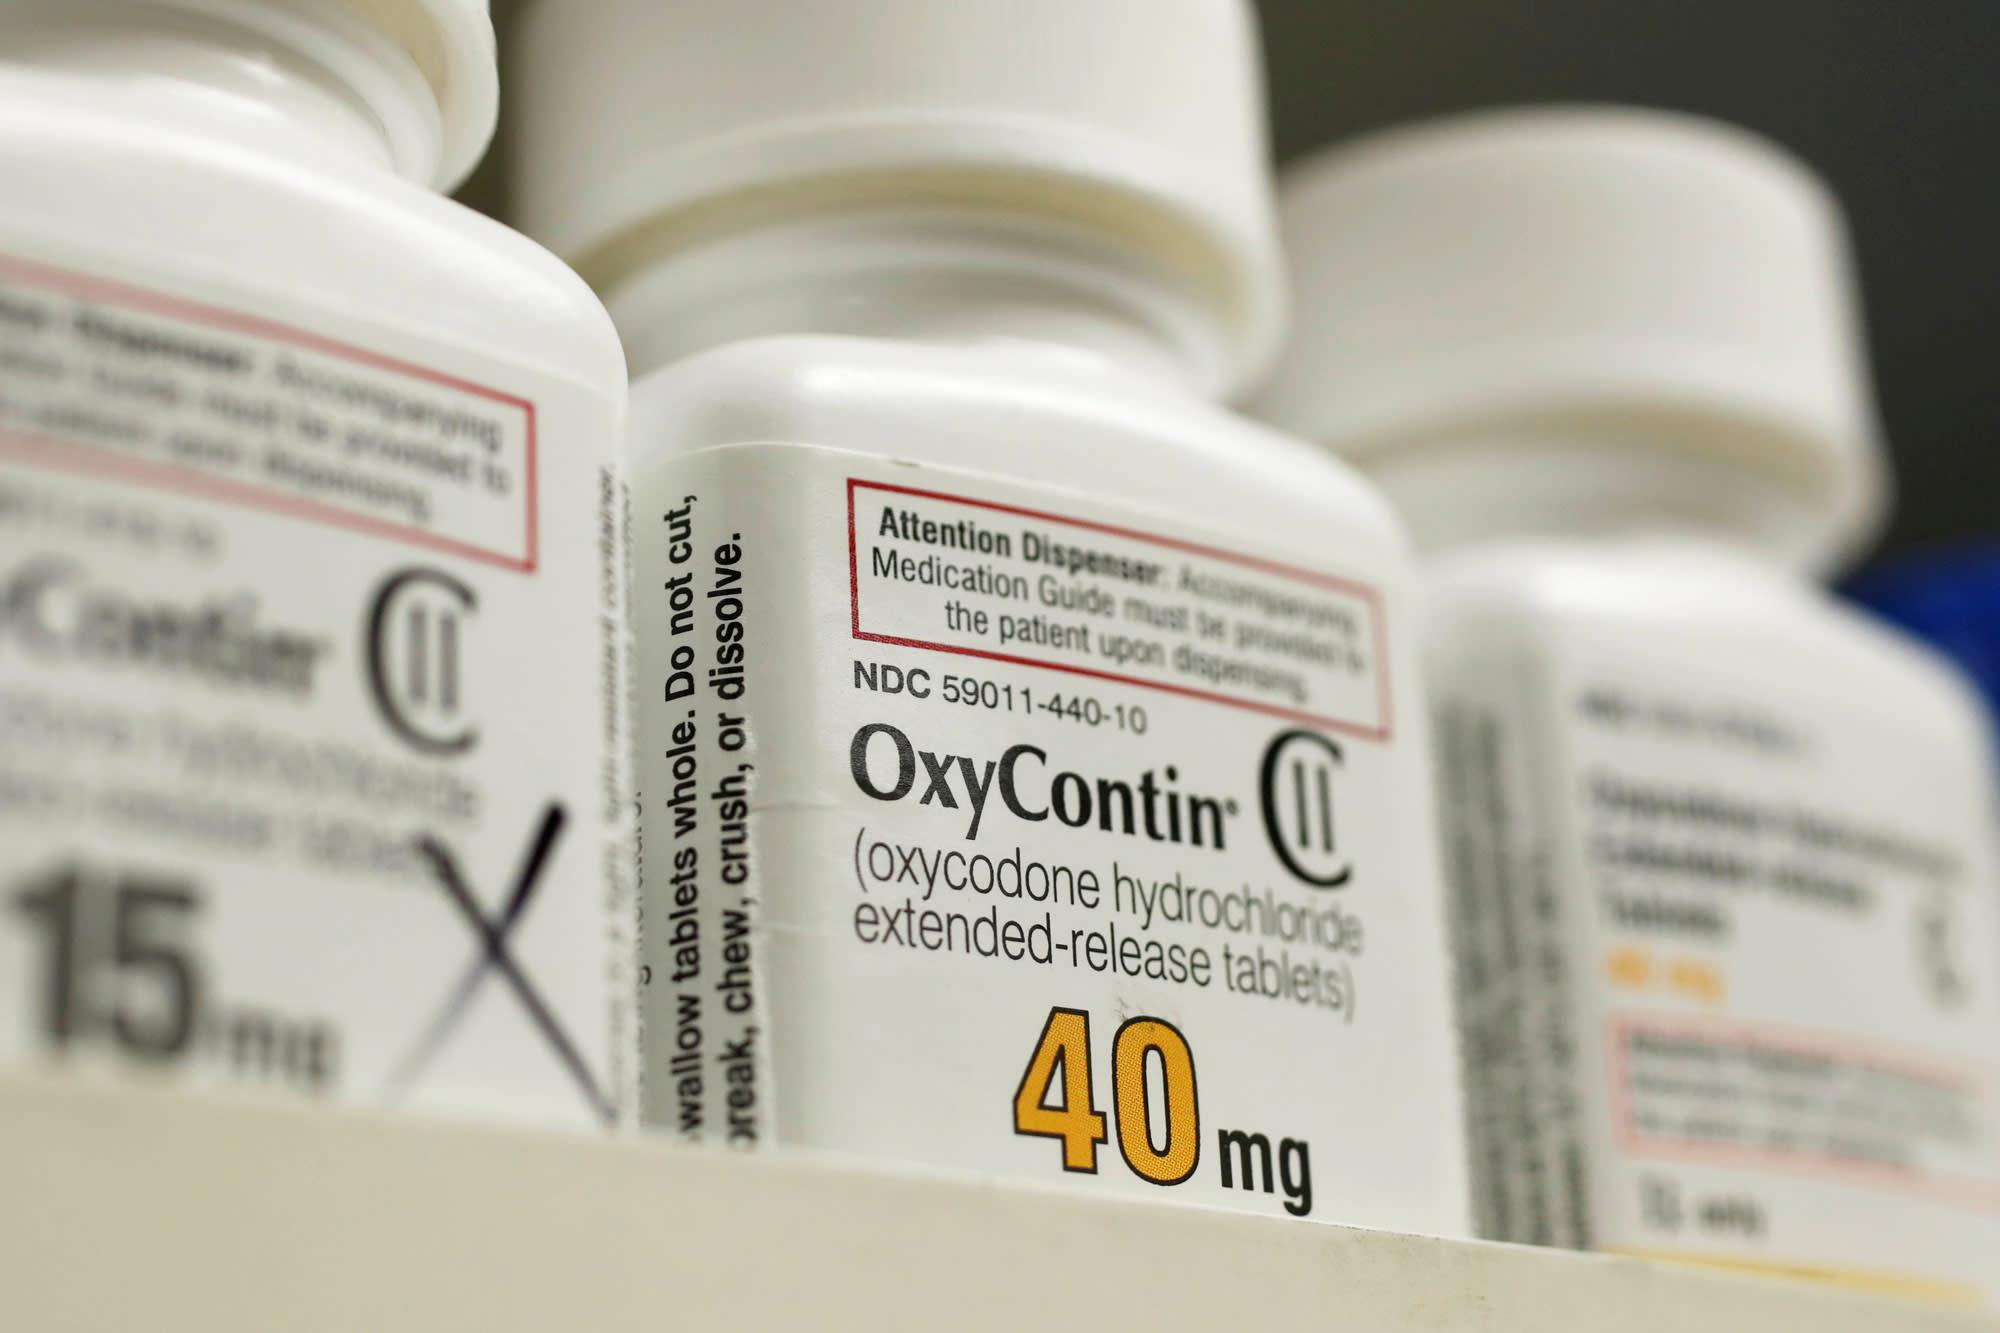 Purdue's Sackler family wants global opioids settlement: Sackler lawyer Mary Jo White